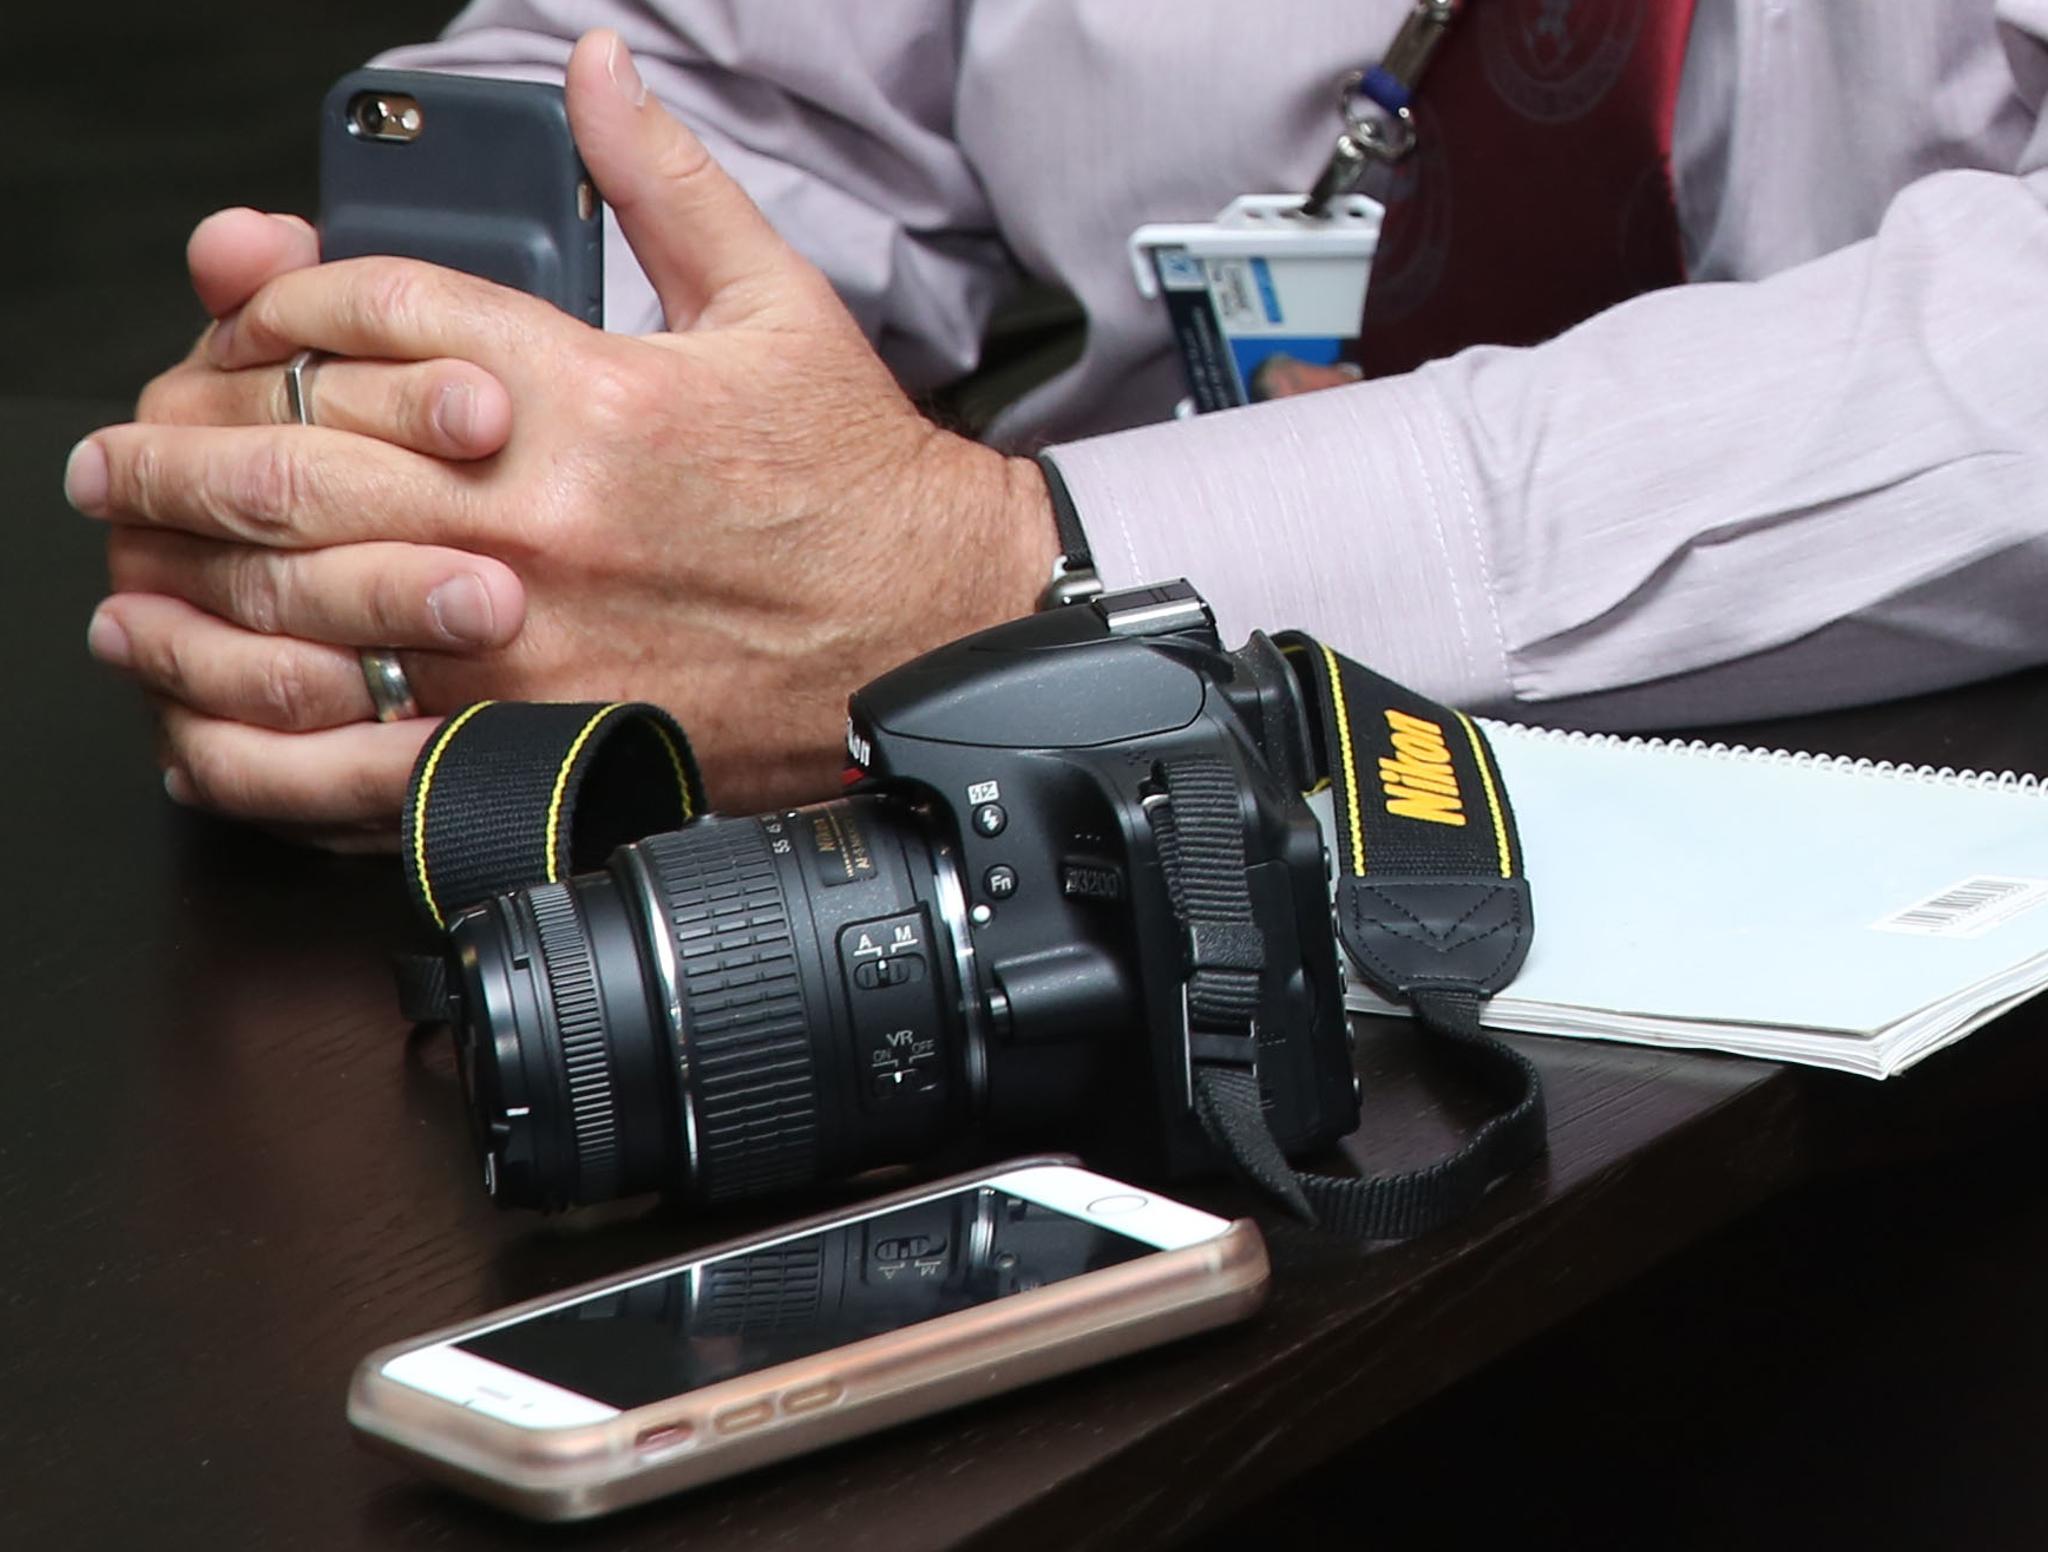 Black Nikon Dslr Camera Beside Person's Hands